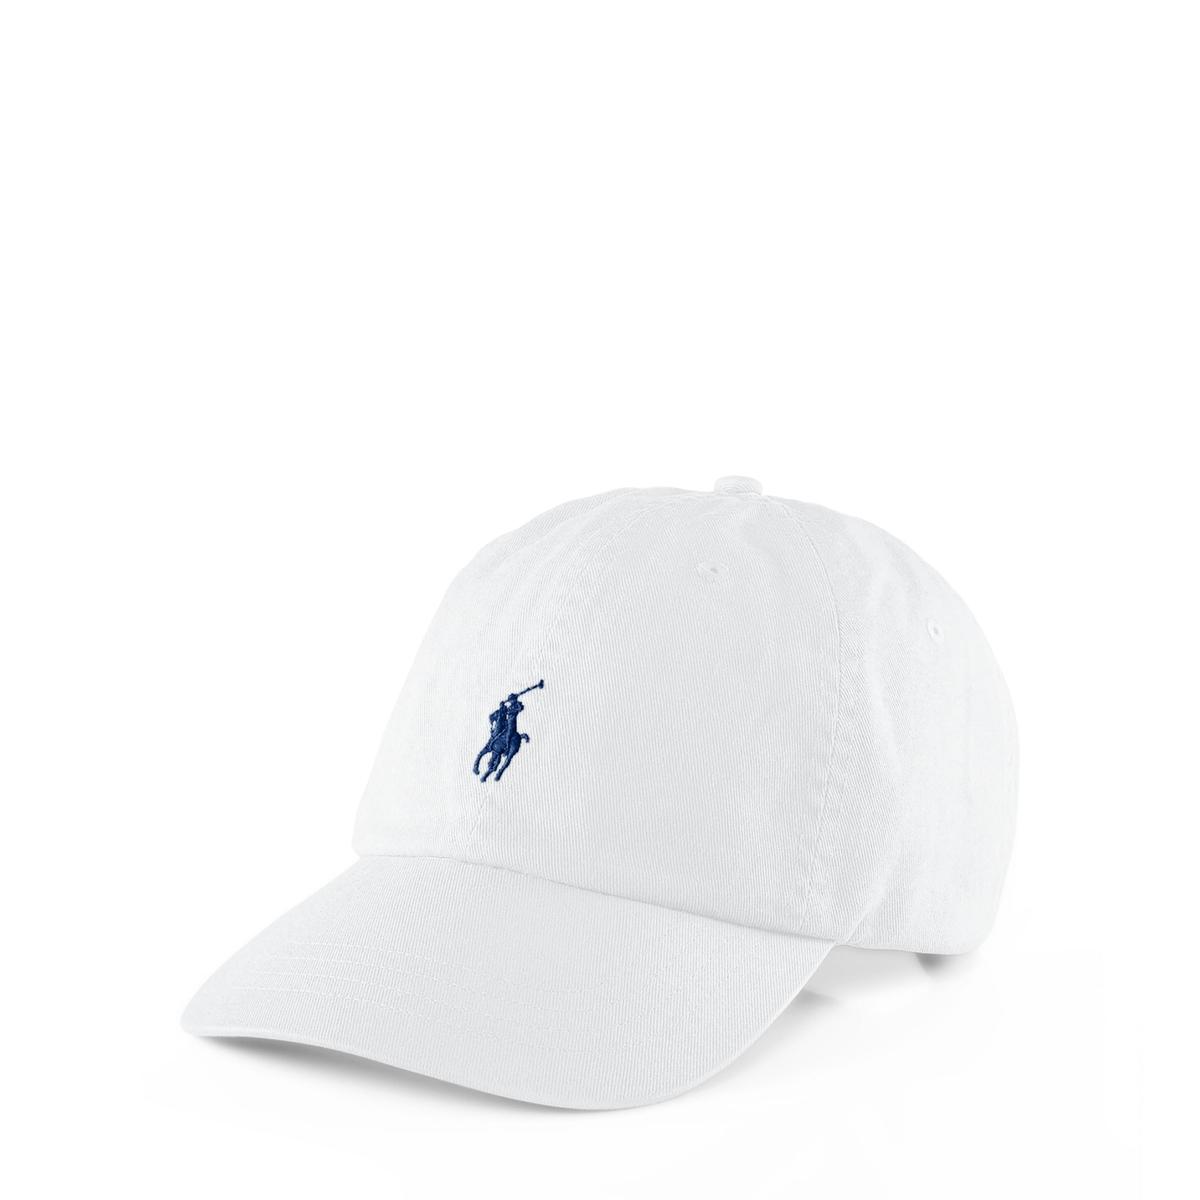 Бейсболка La Redoute Polo Player единый размер белый